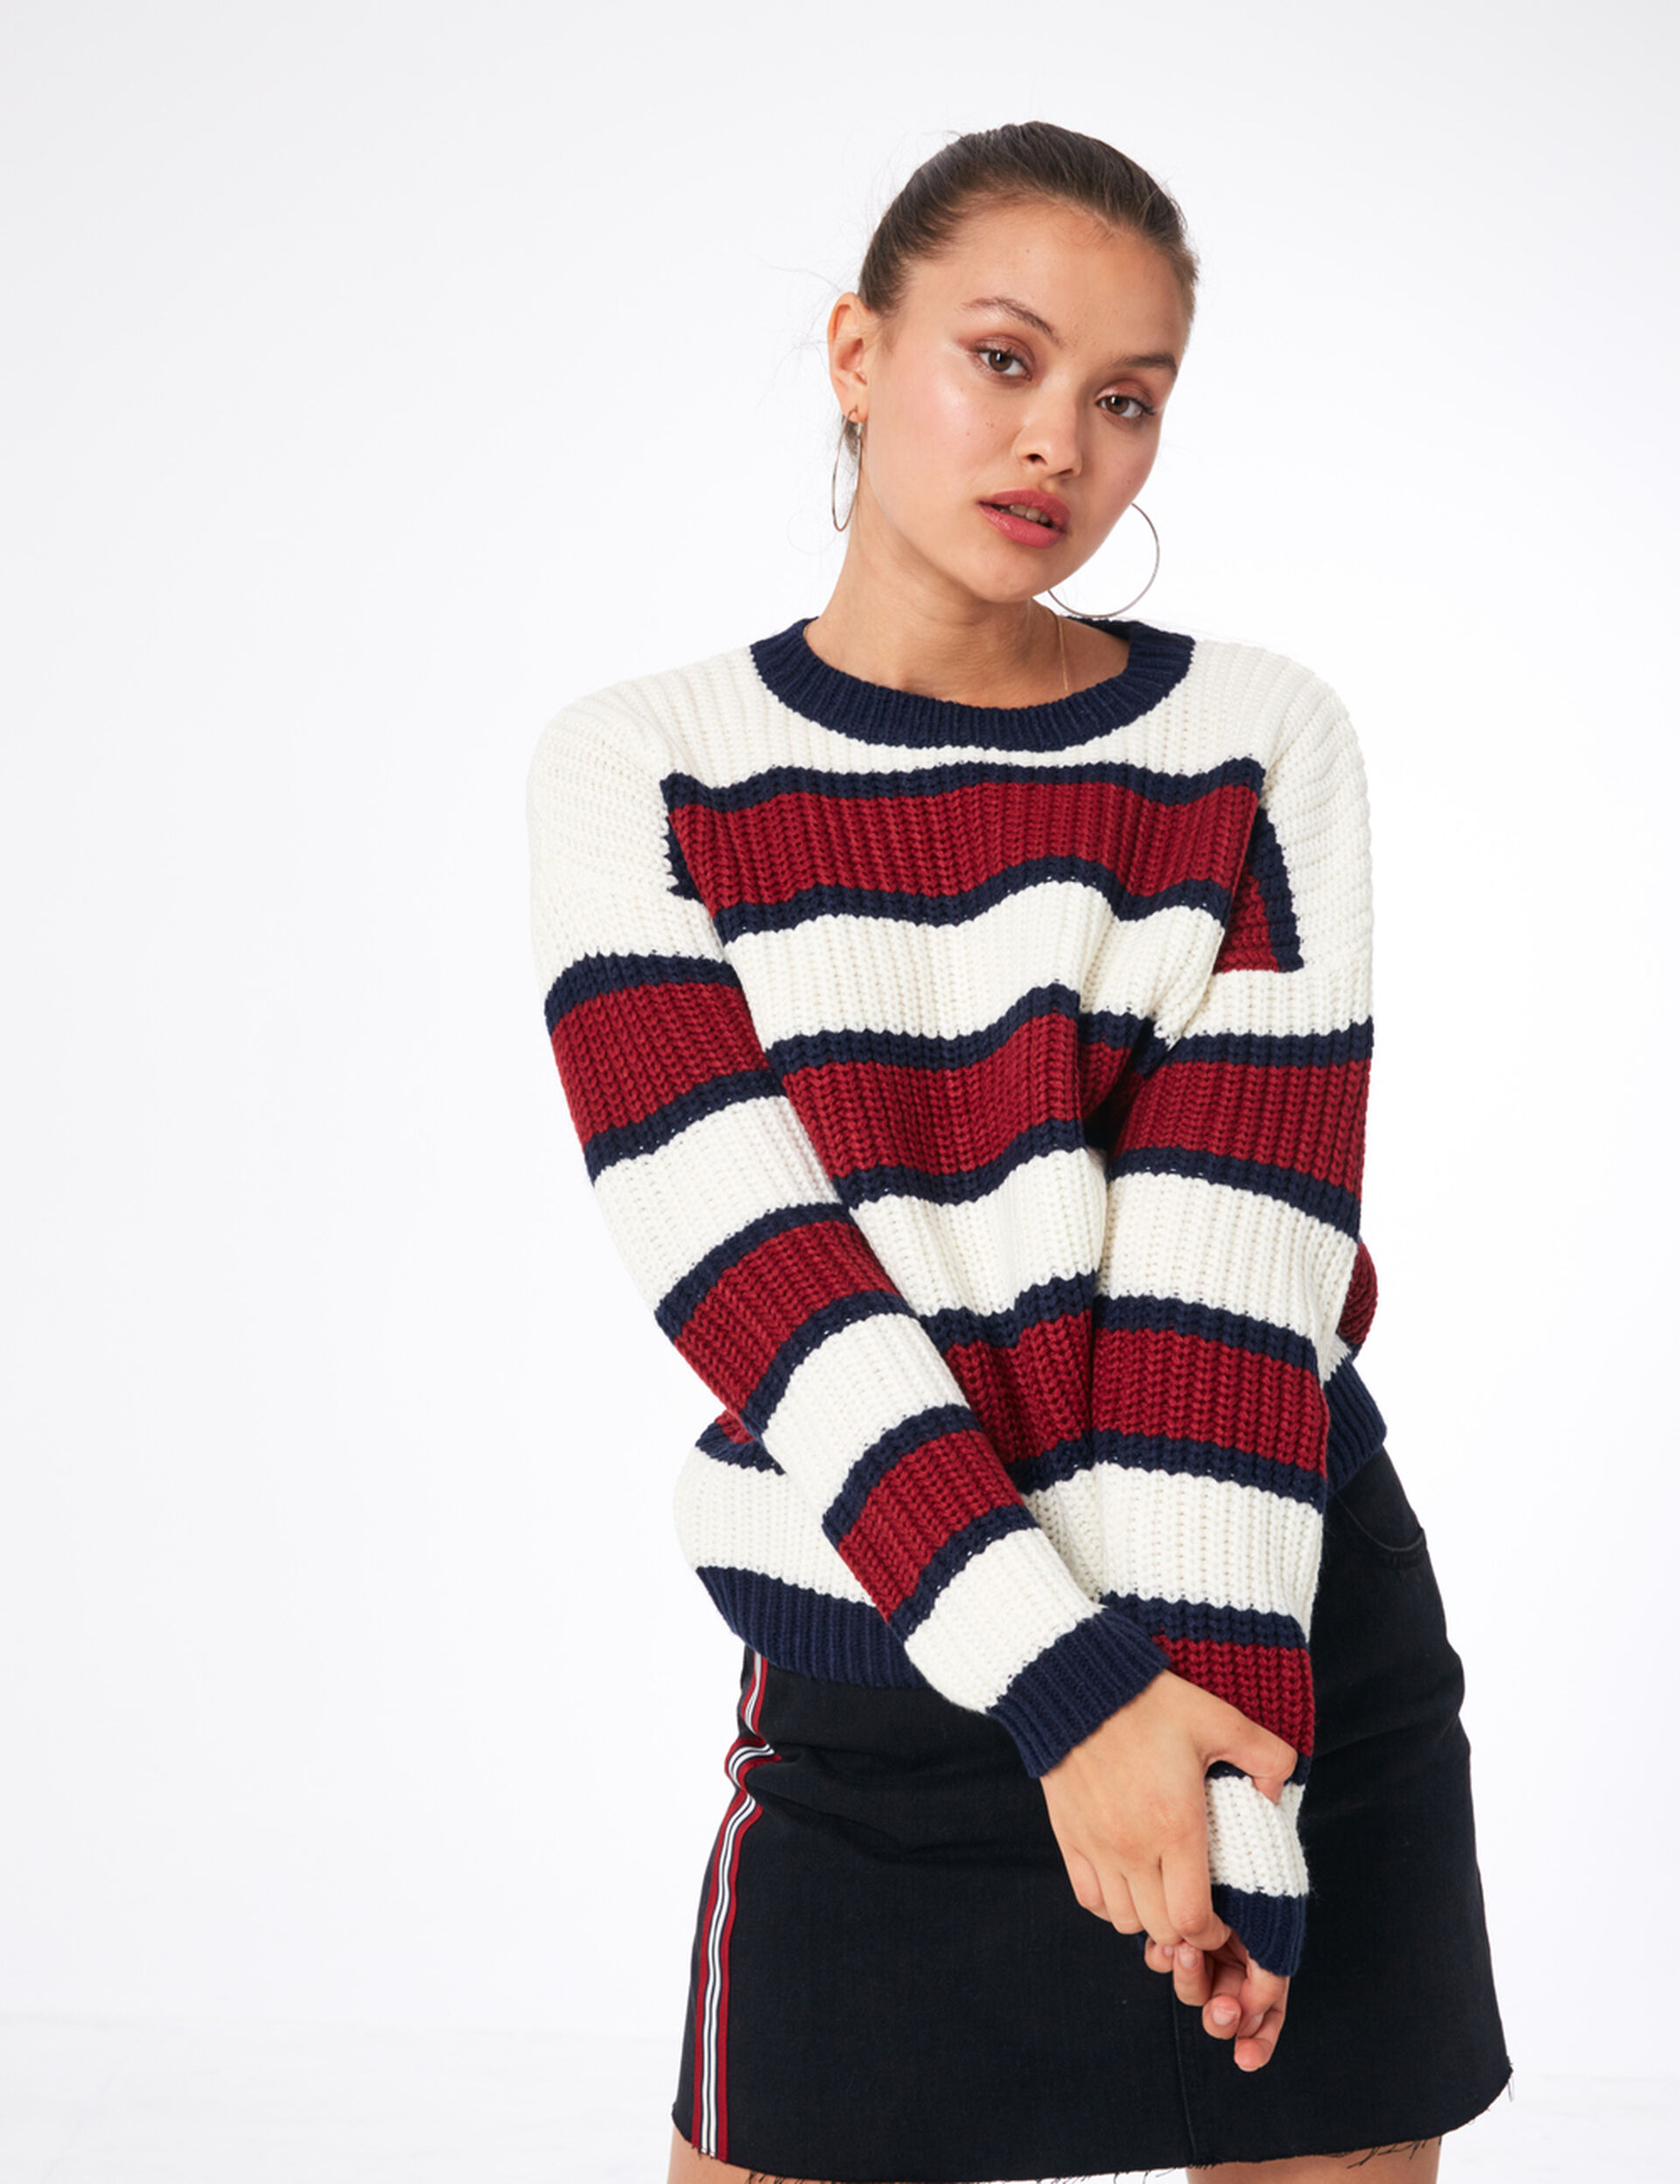 Cream, burgundy and navy blue striped jumper